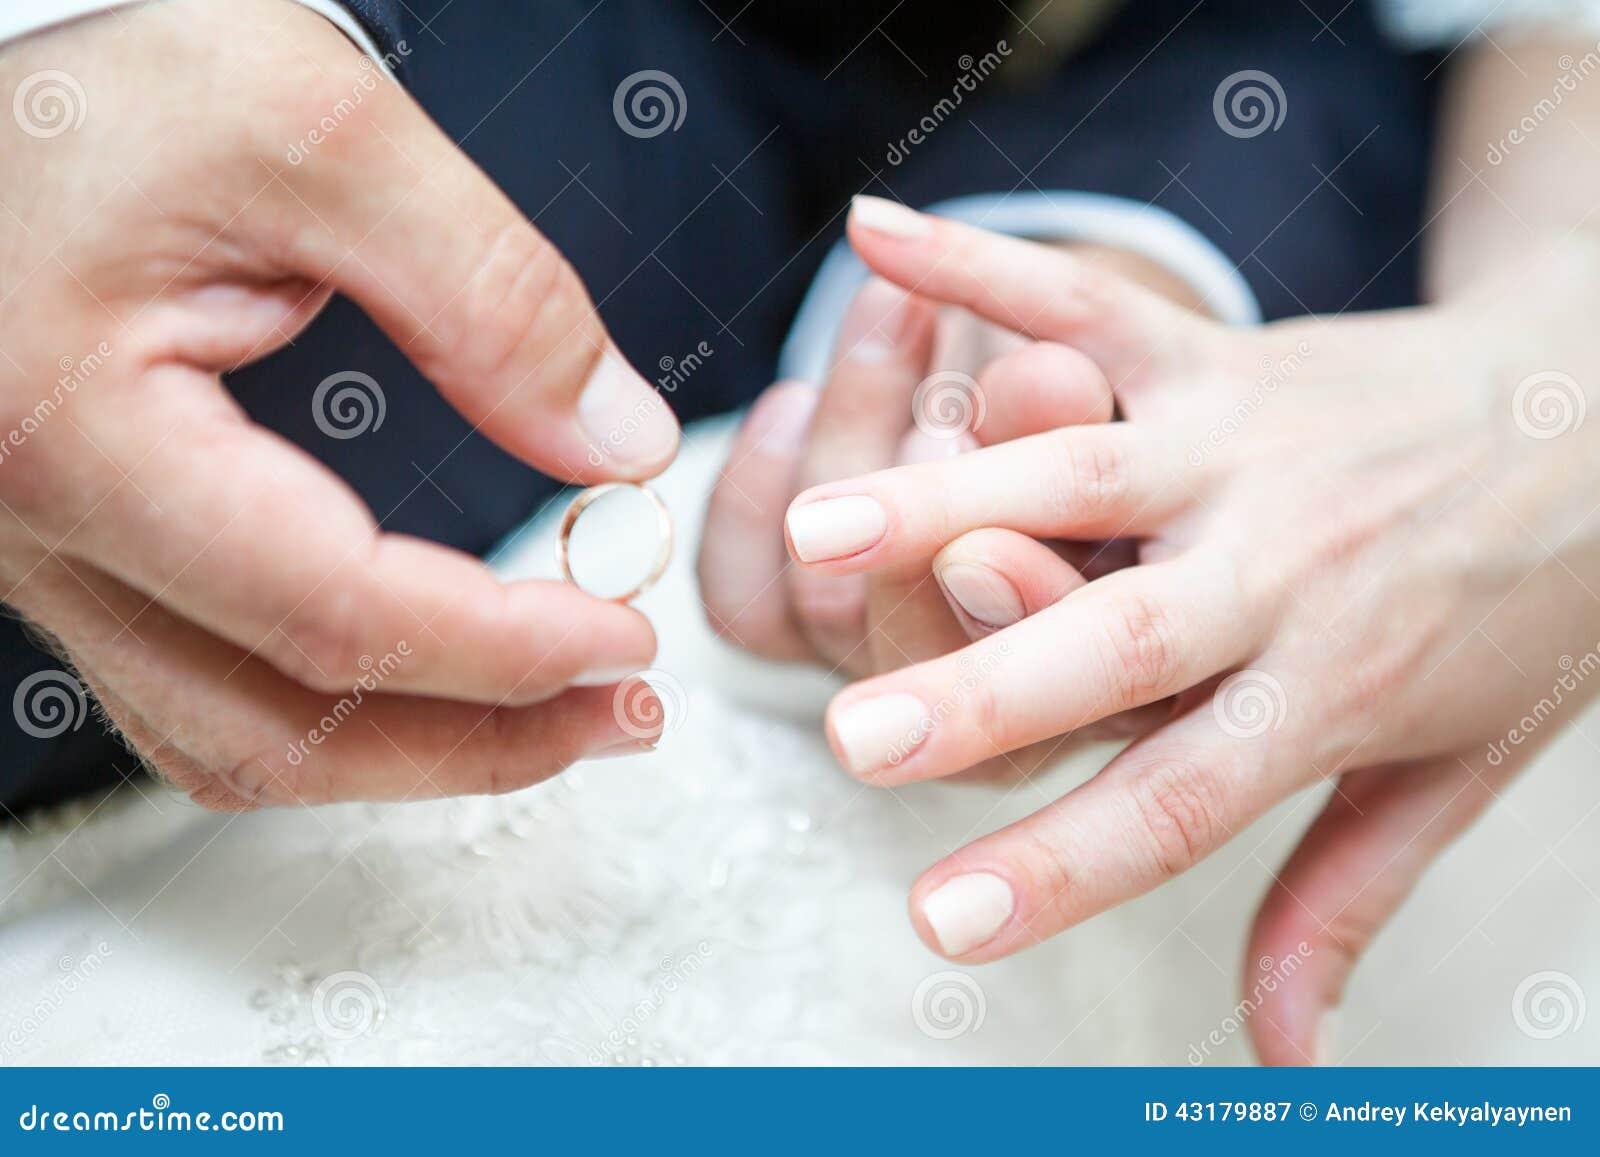 Mariage Doigt